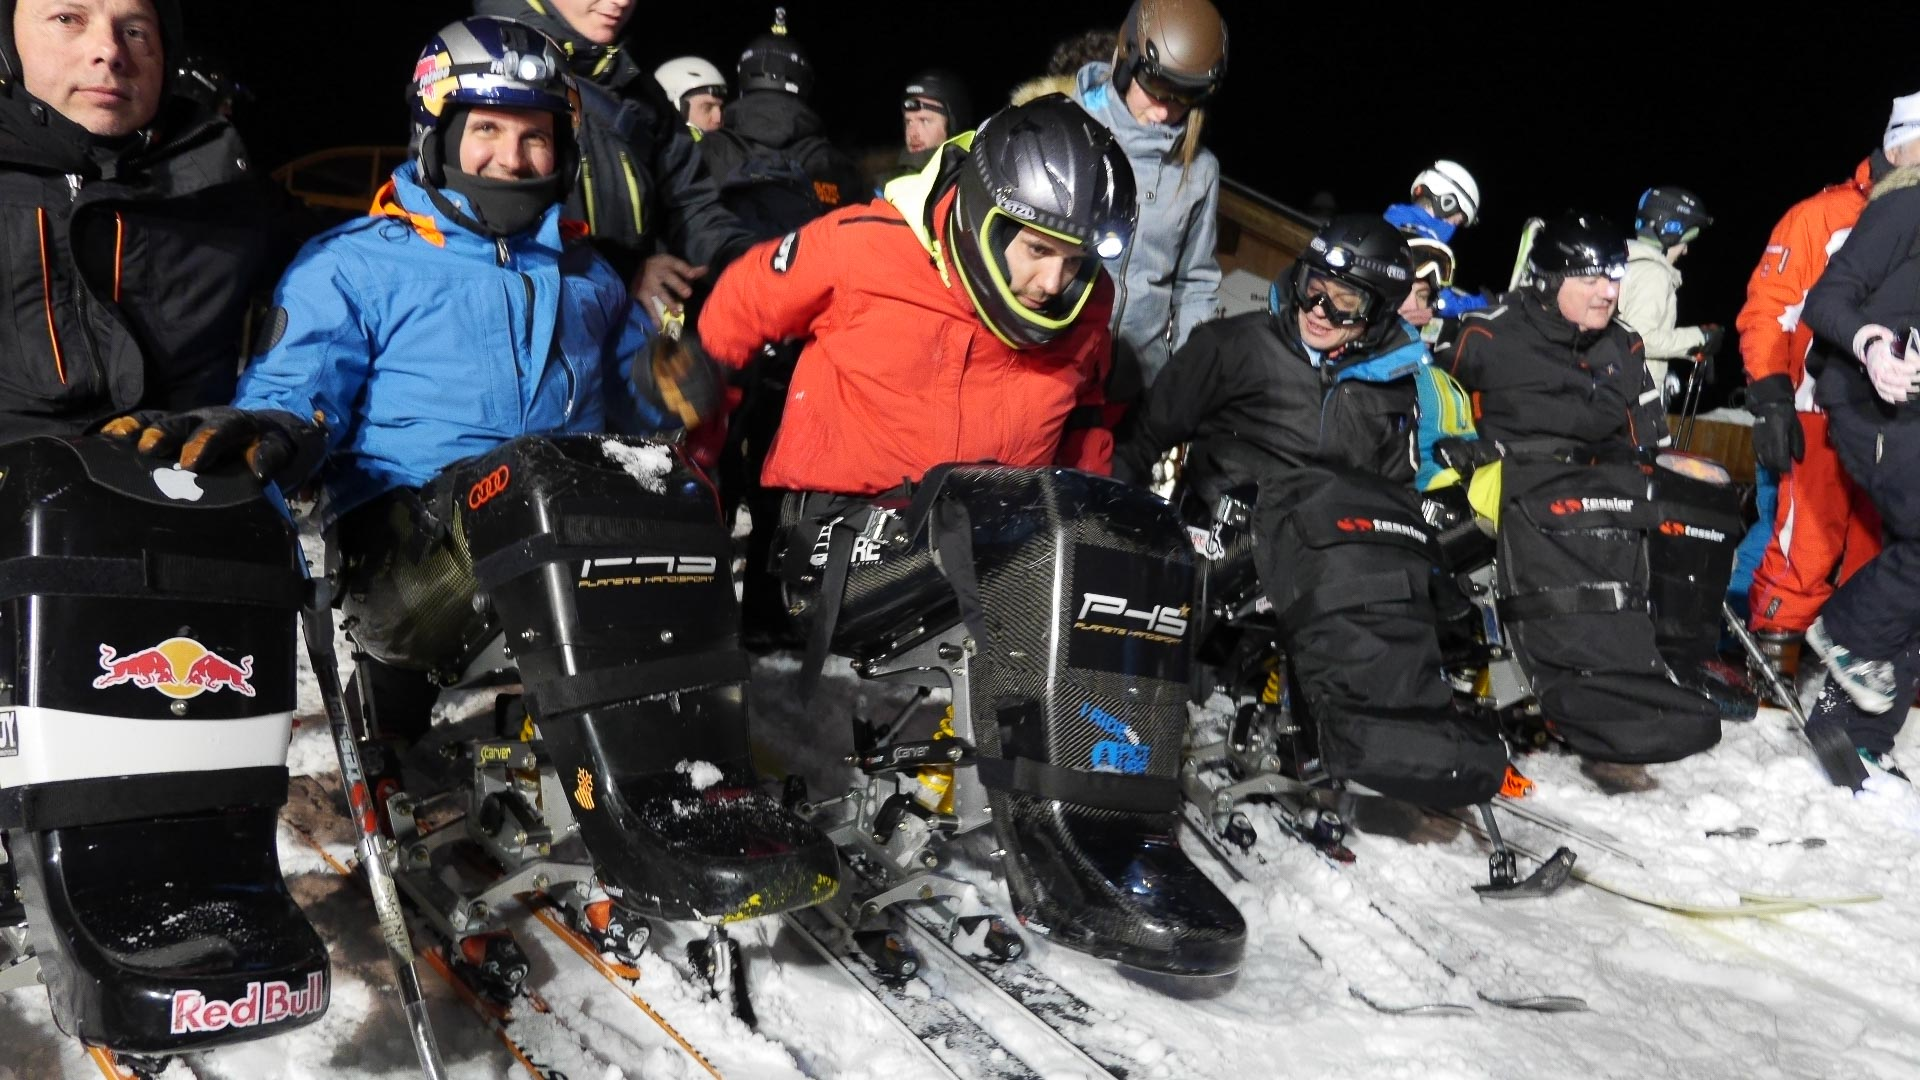 moonlight-handi-ski